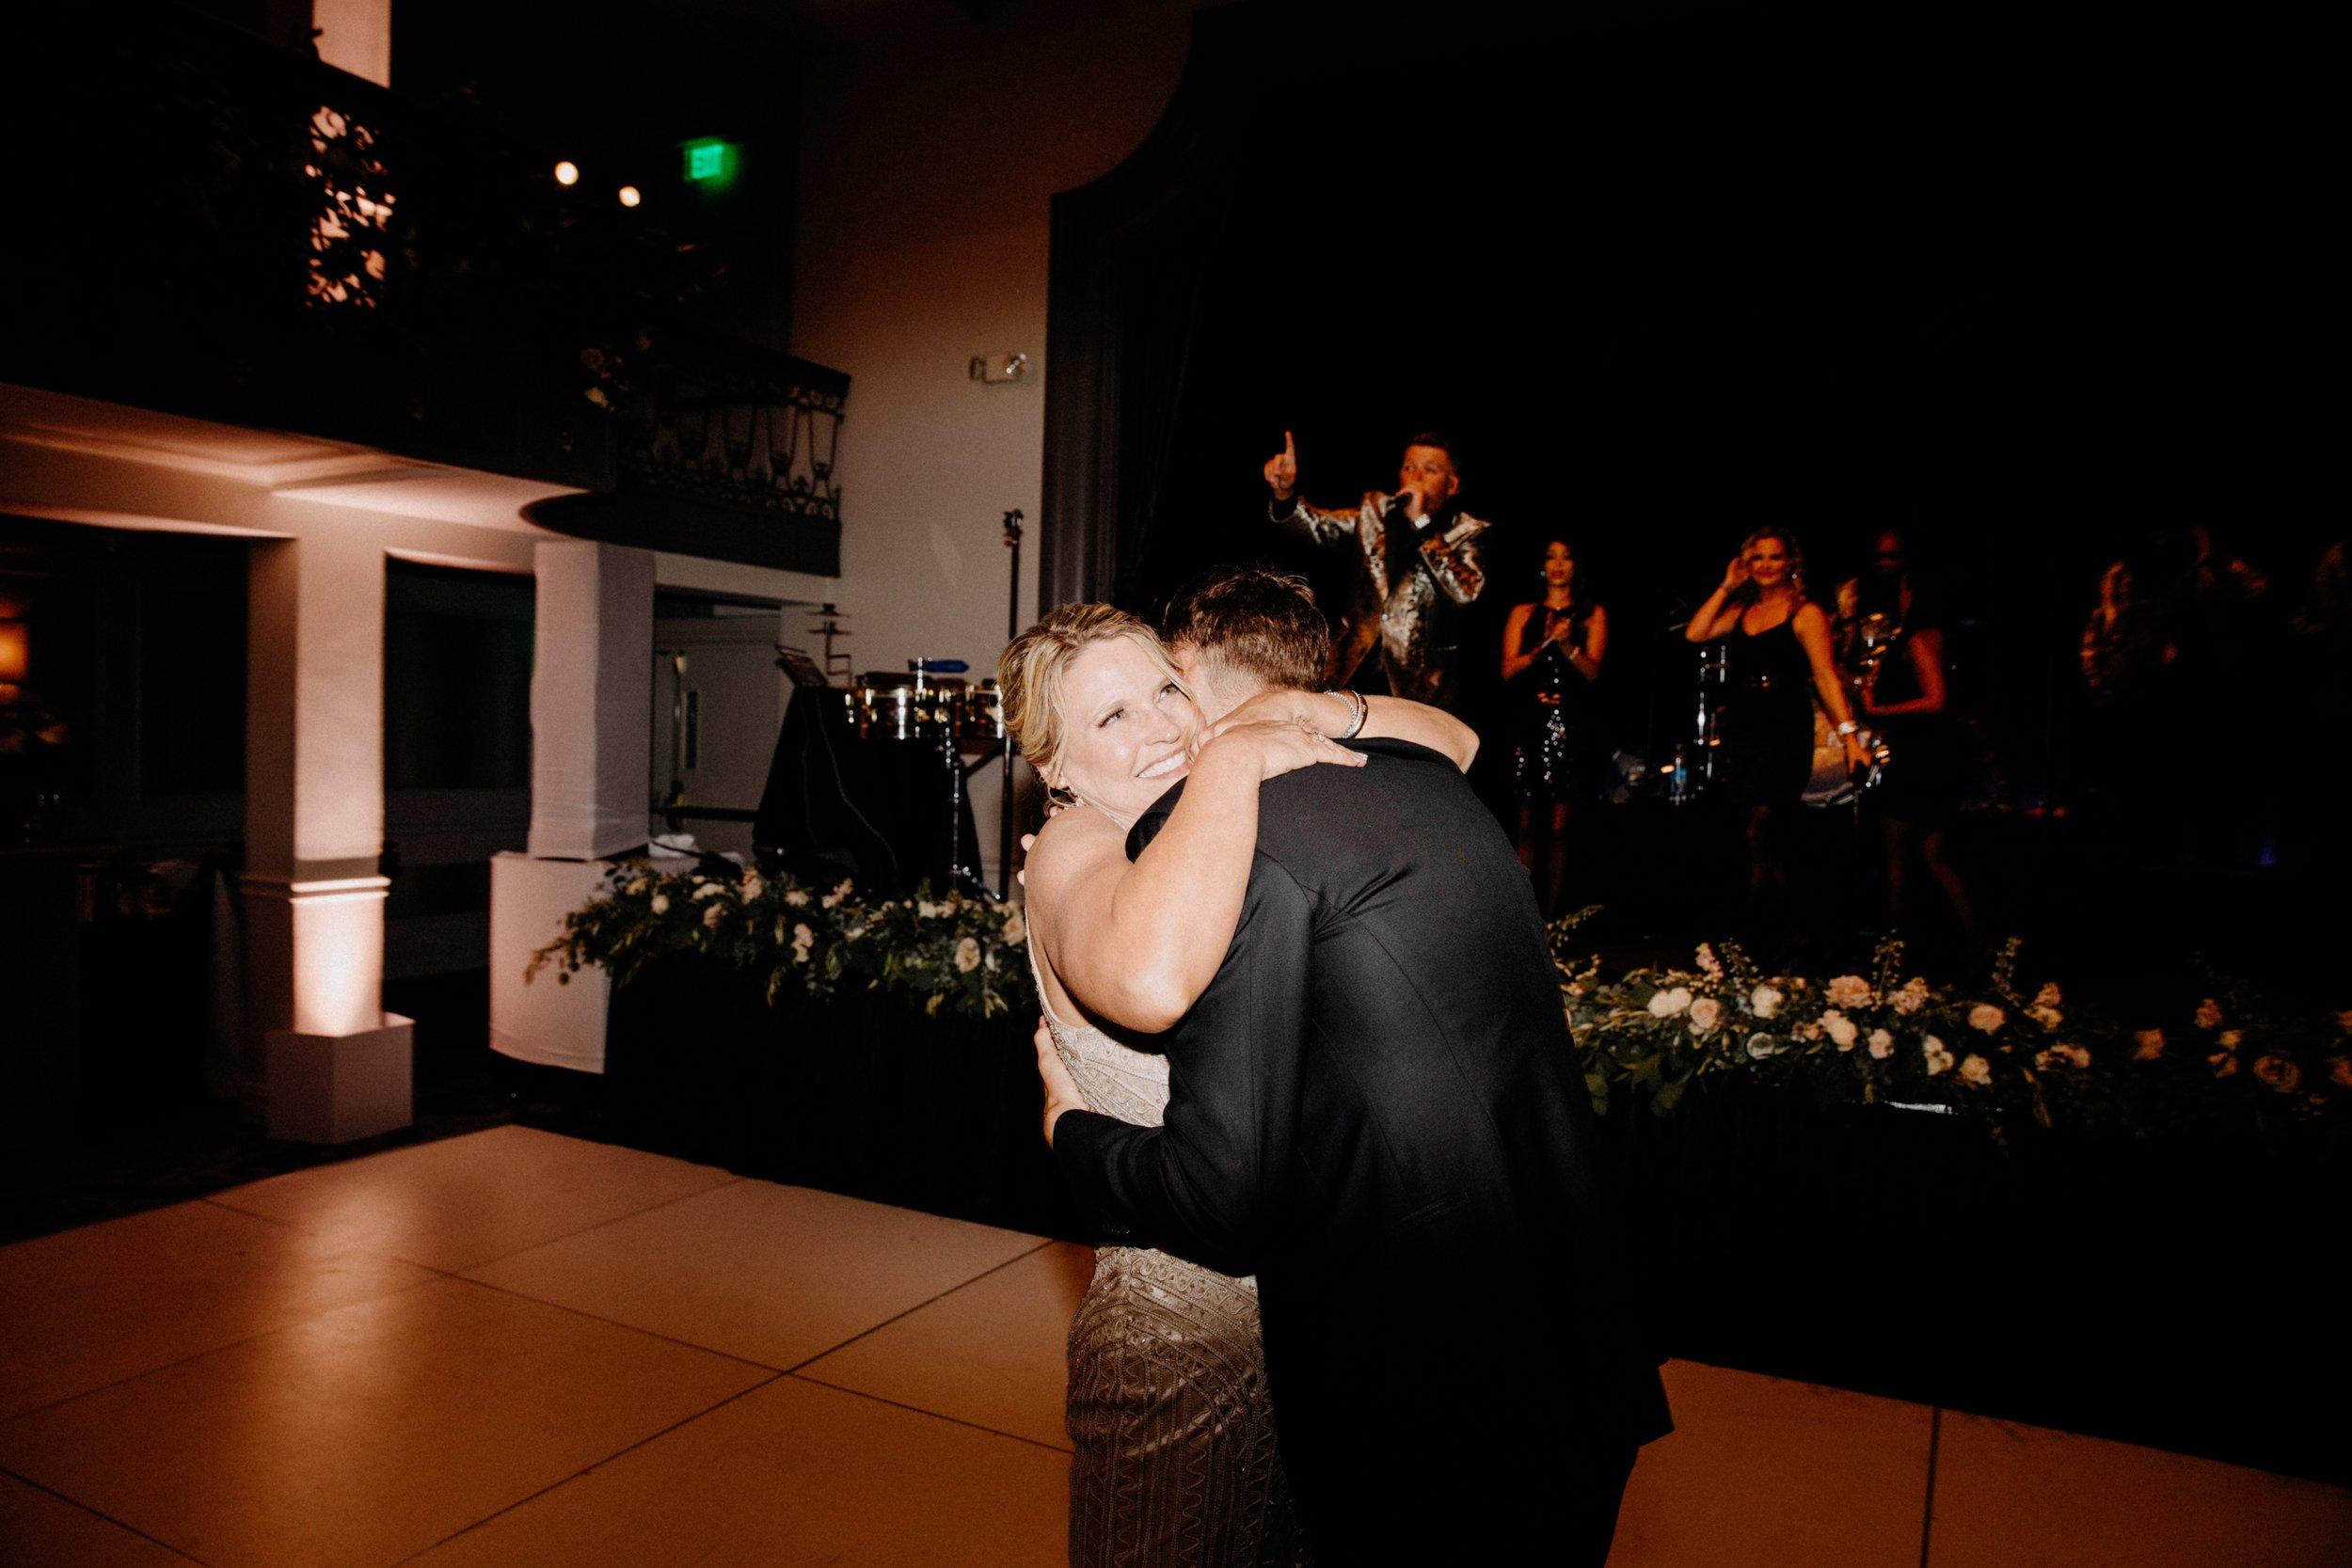 st-anthony-hotel-wedding-photography-10162san-antonio.JPG